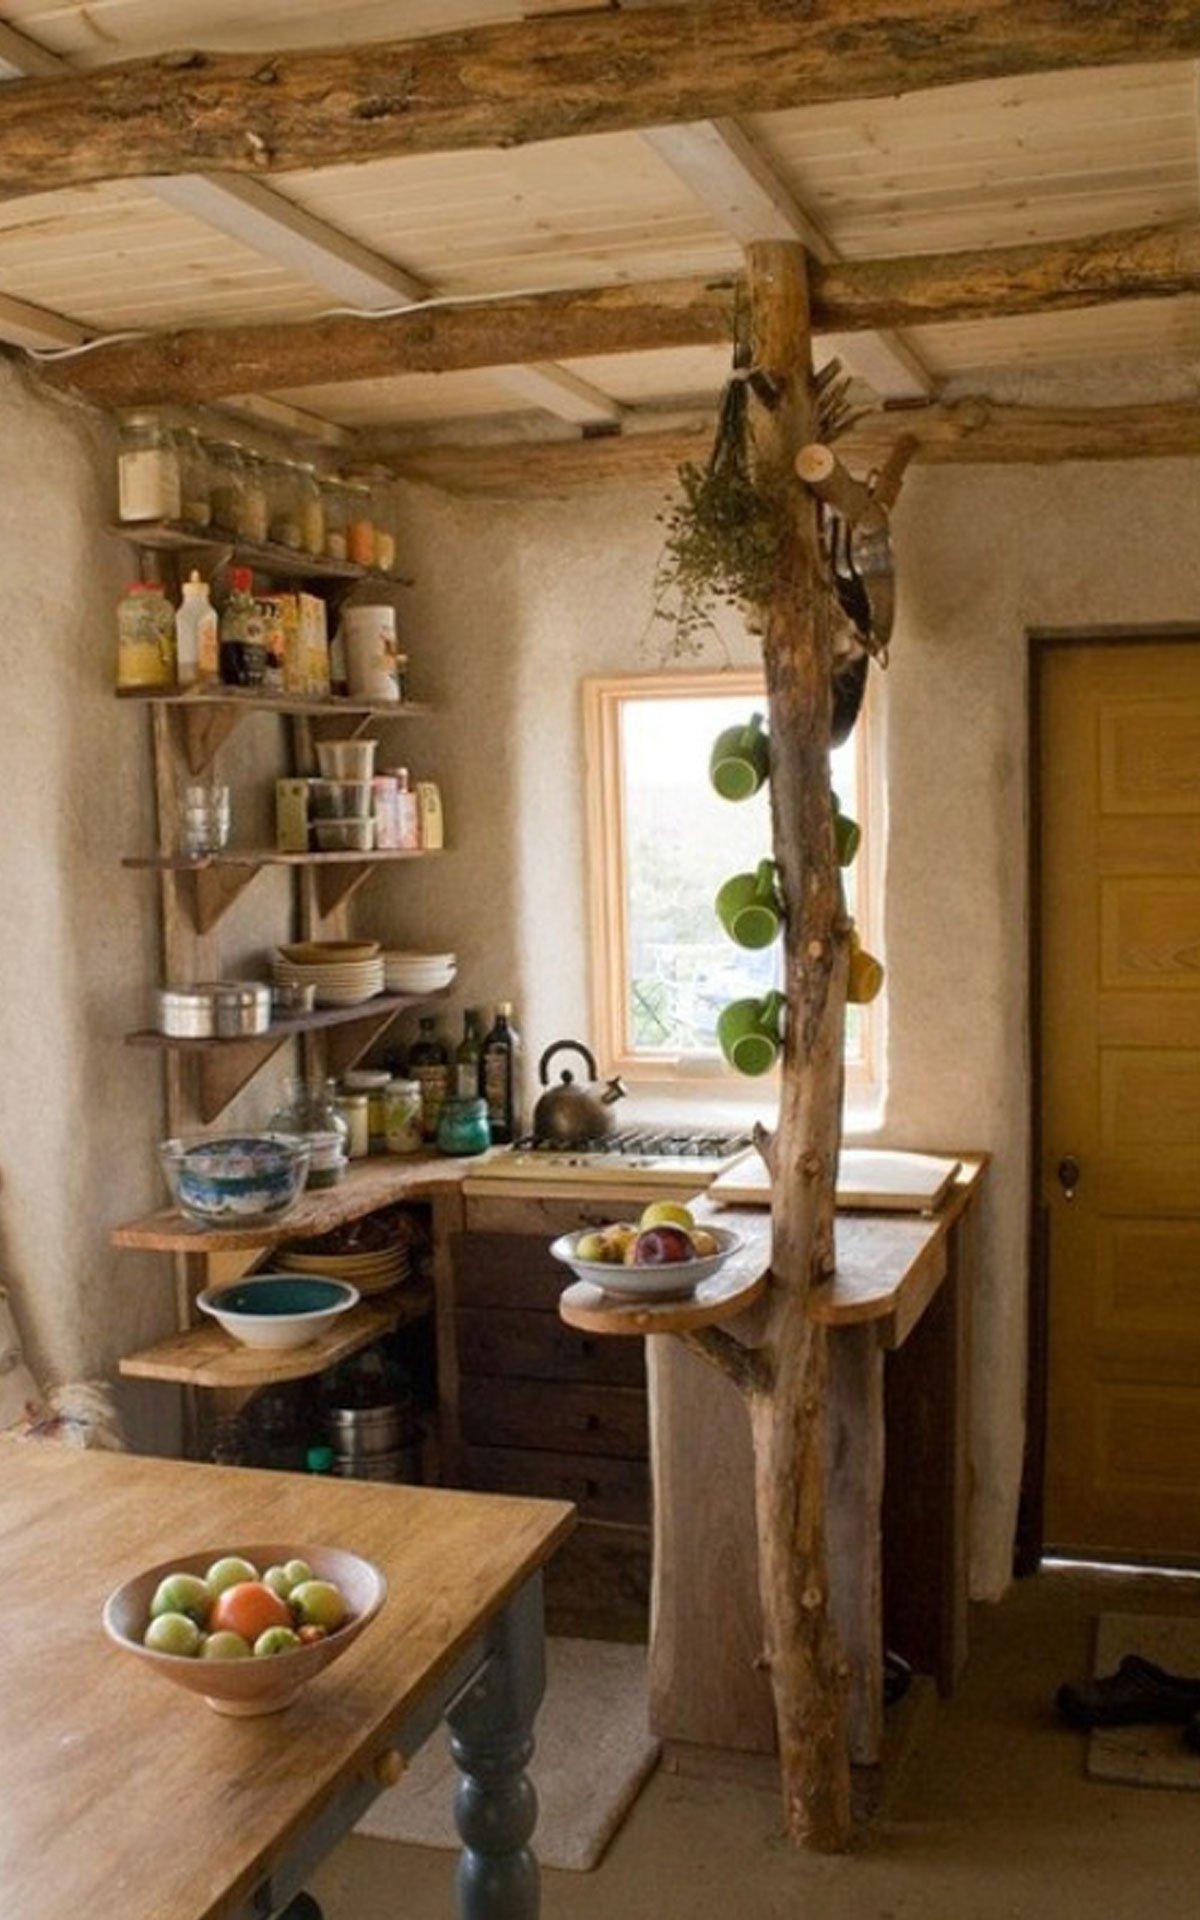 драники из кабачков рецепты пошагово